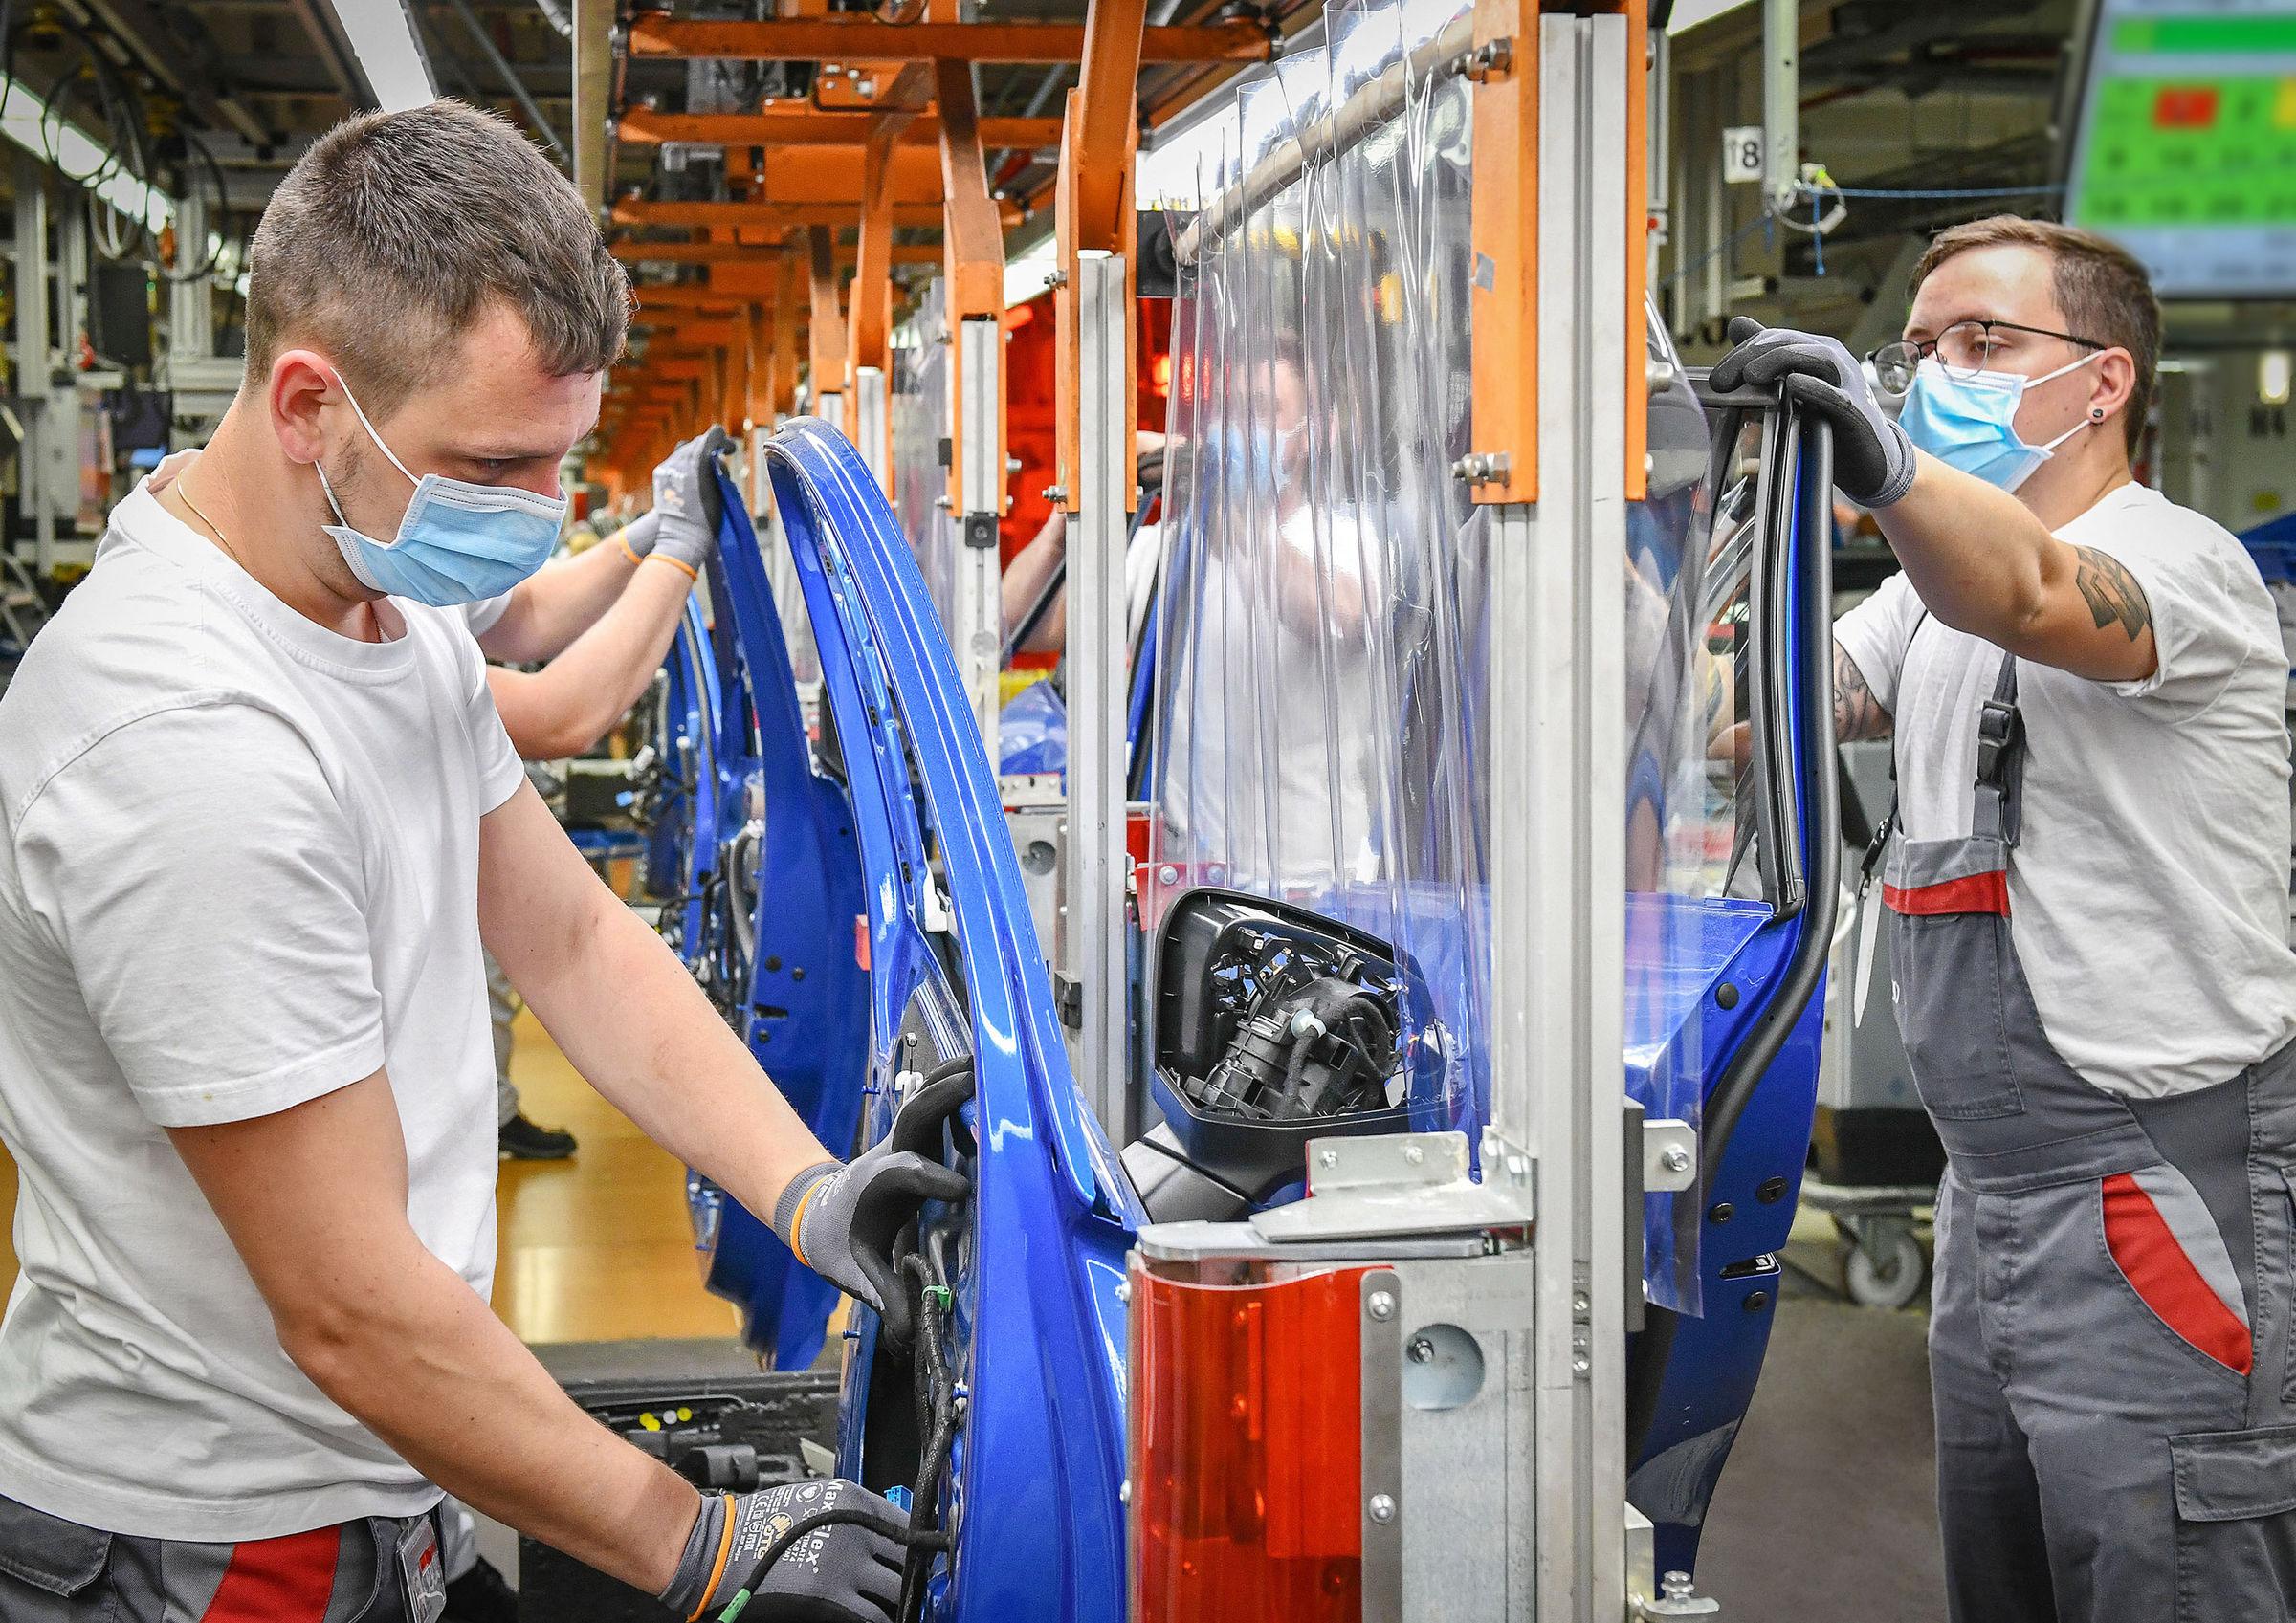 Restart of production at Audi in Ingolstadt - Image 2